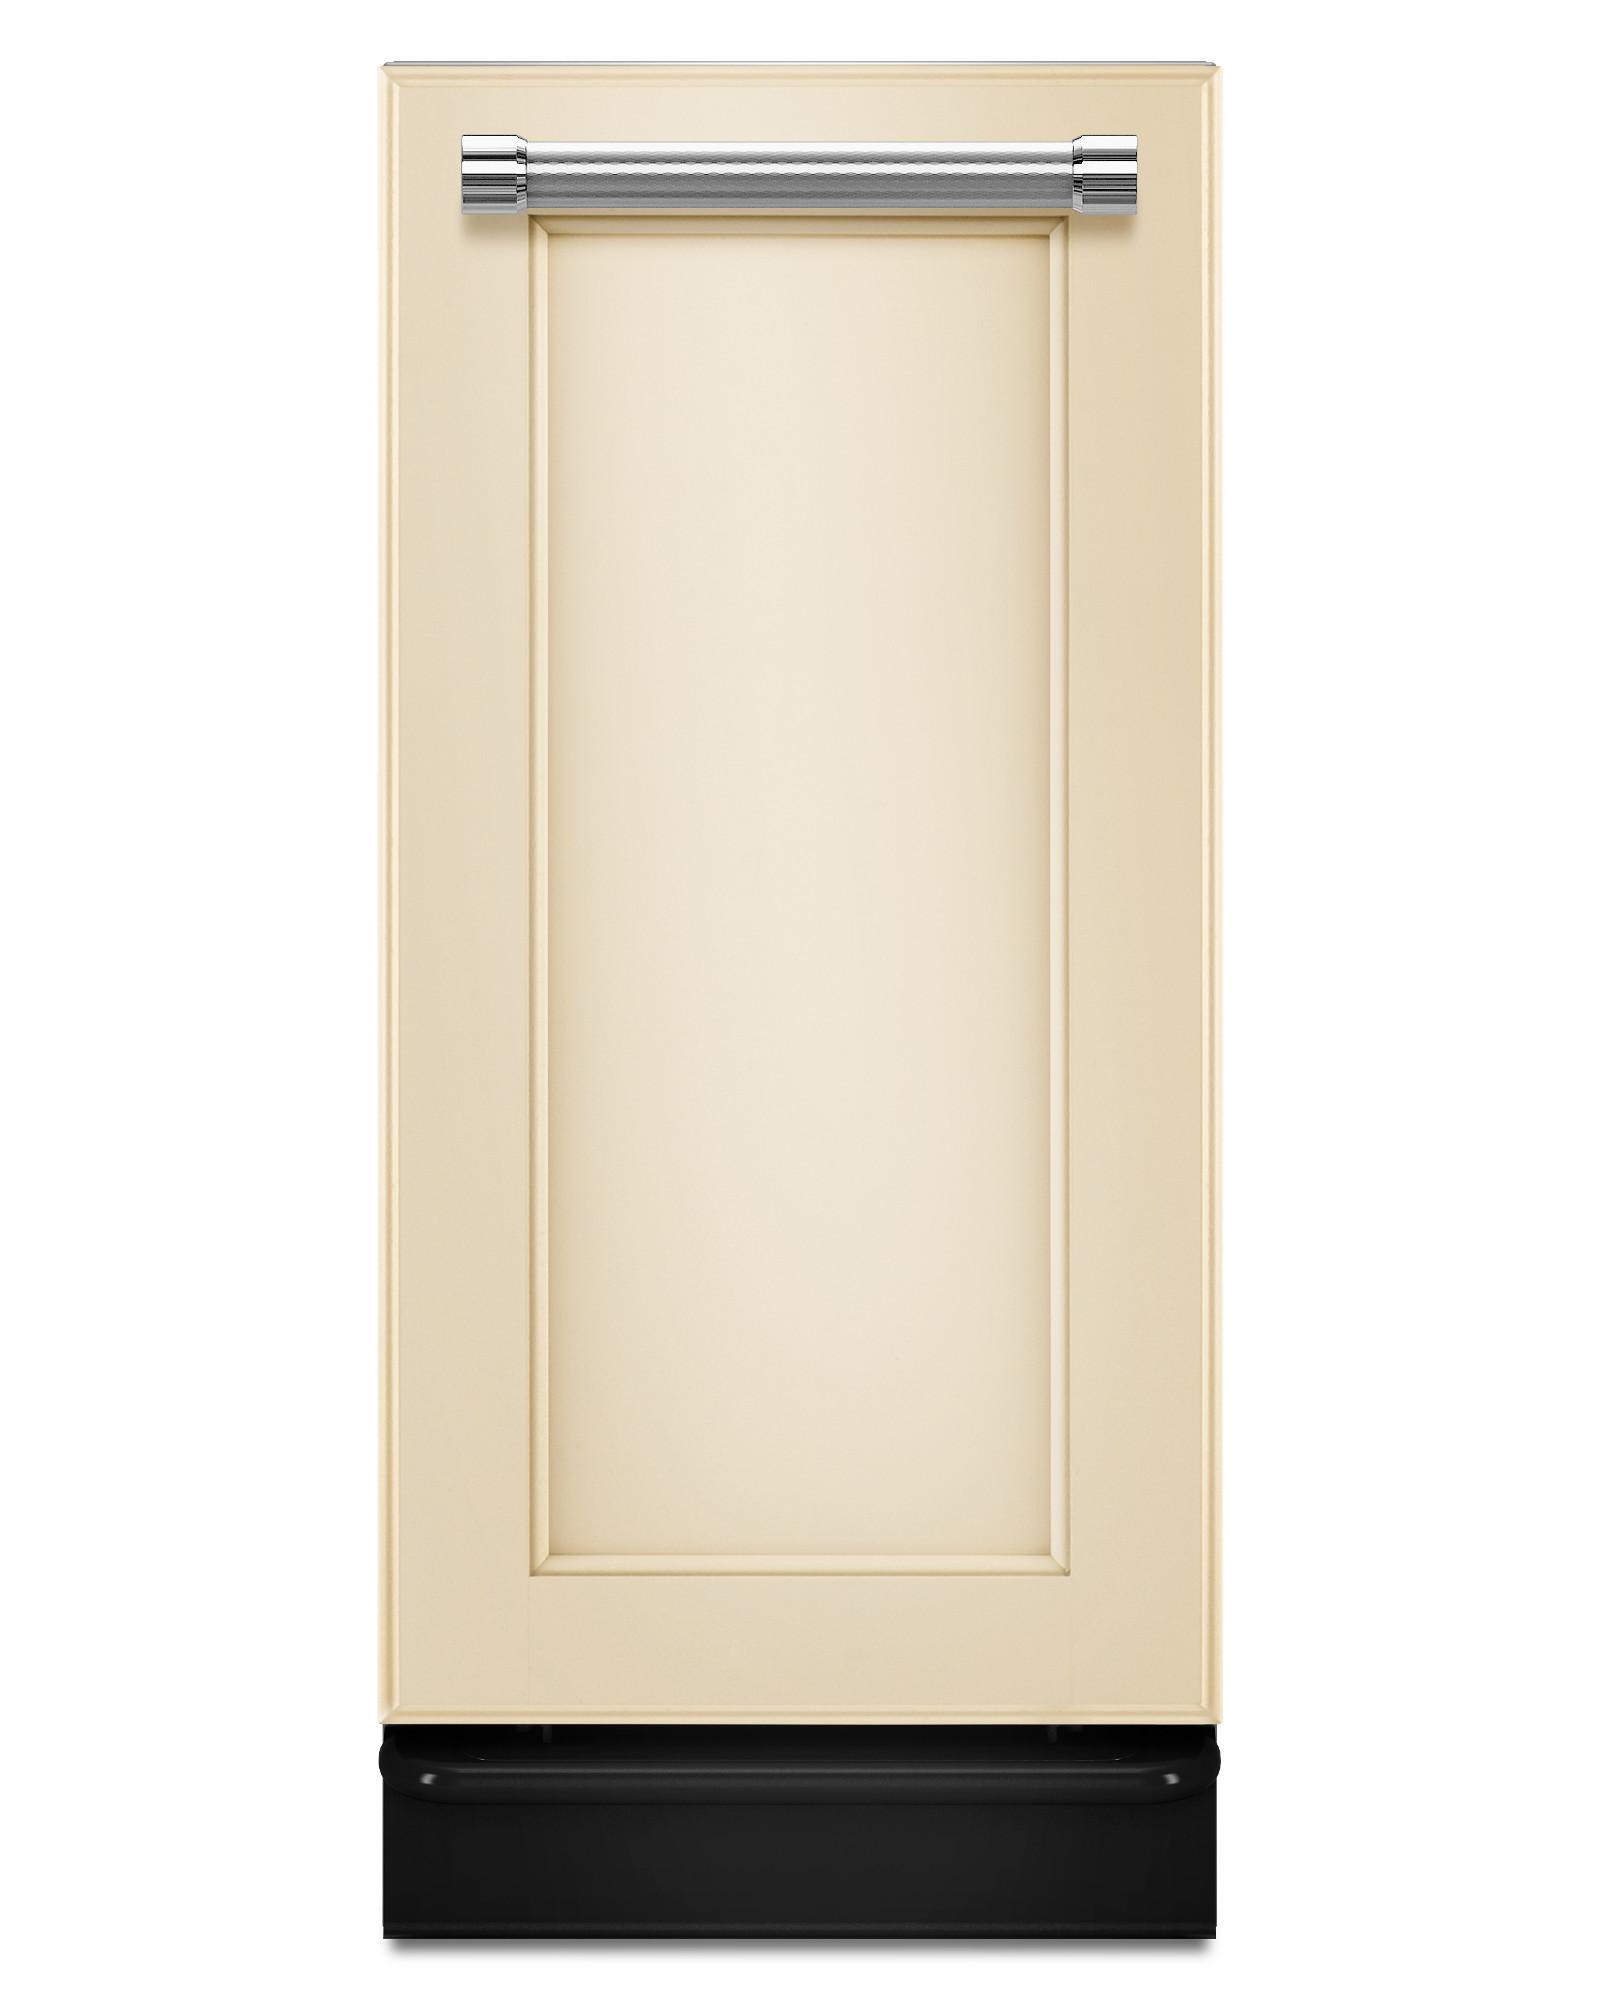 KitchenAid KTTS505EPA 1.4 cu. ft. Built-In Trash Compactor - Panel Ready